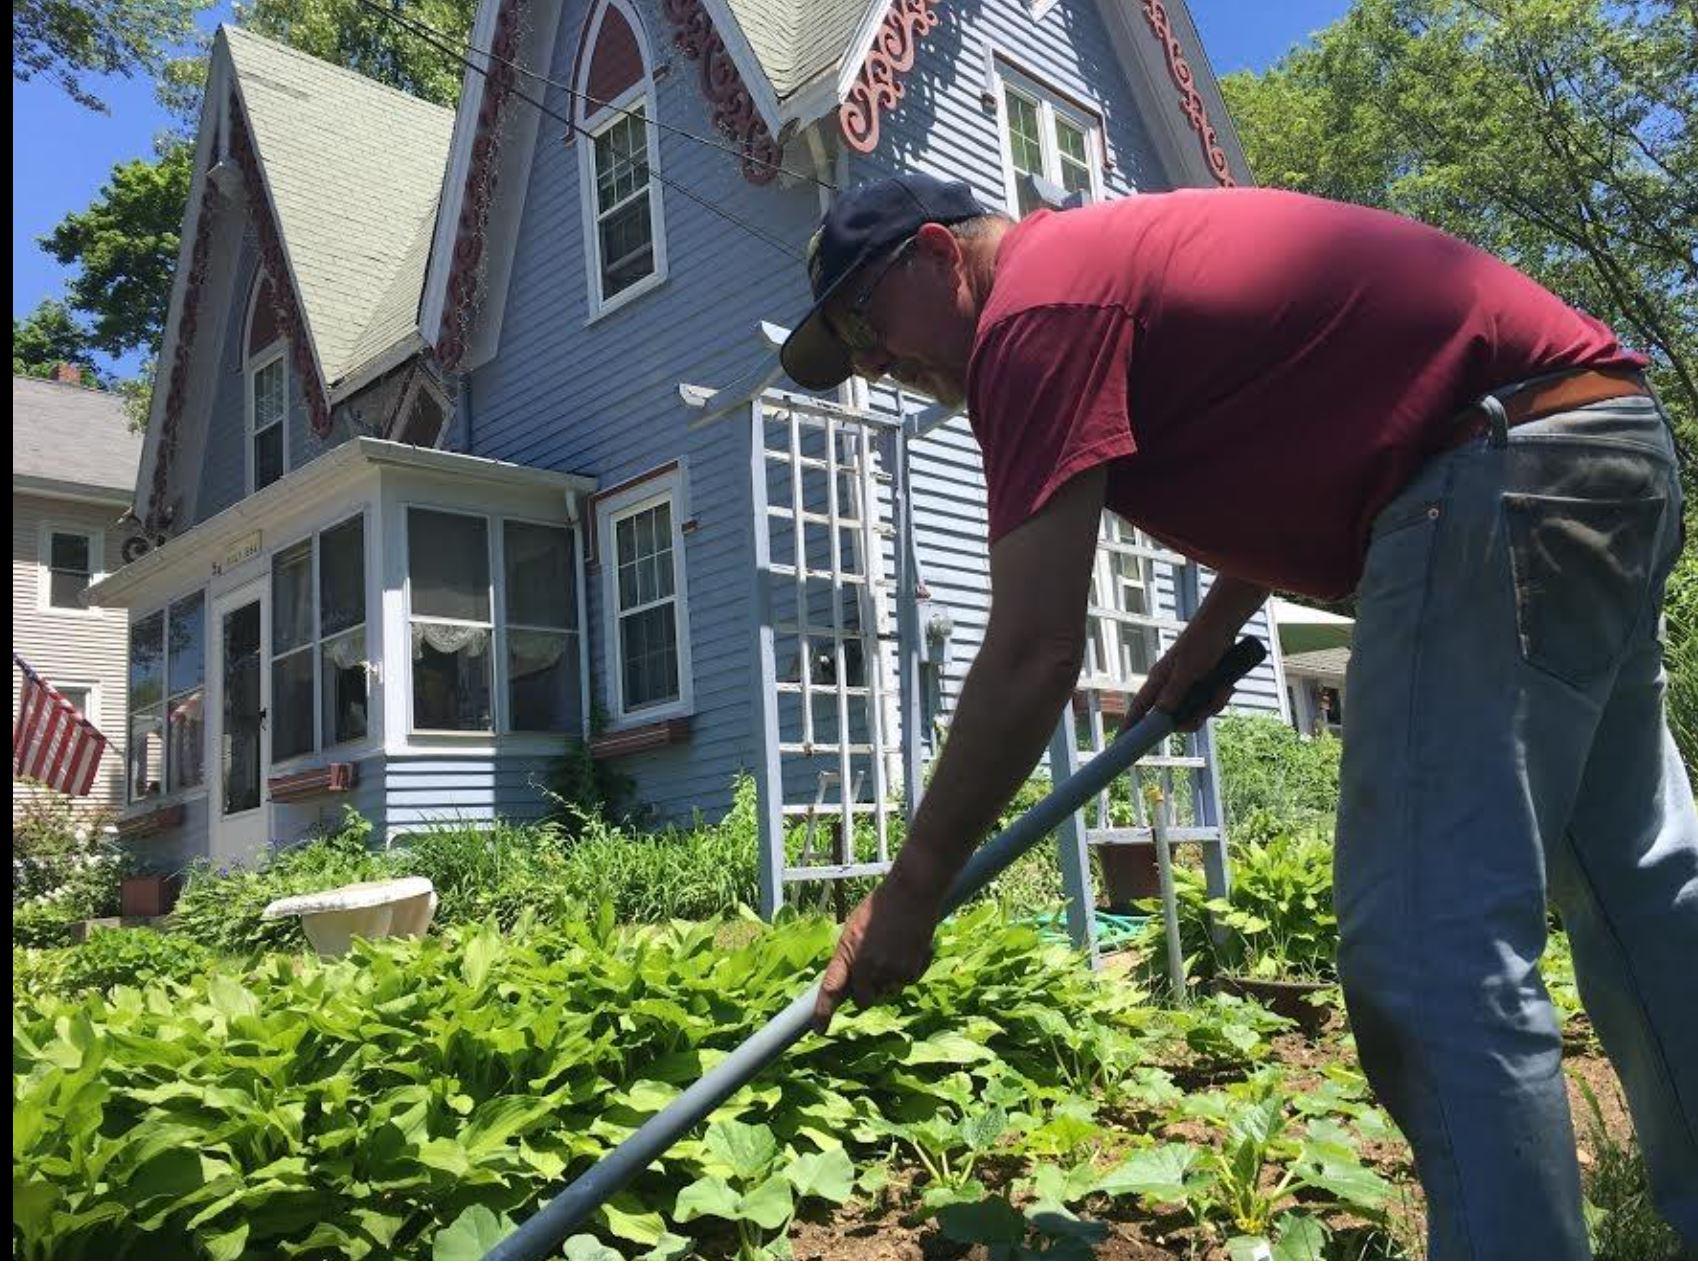 Paul gardening.JPG